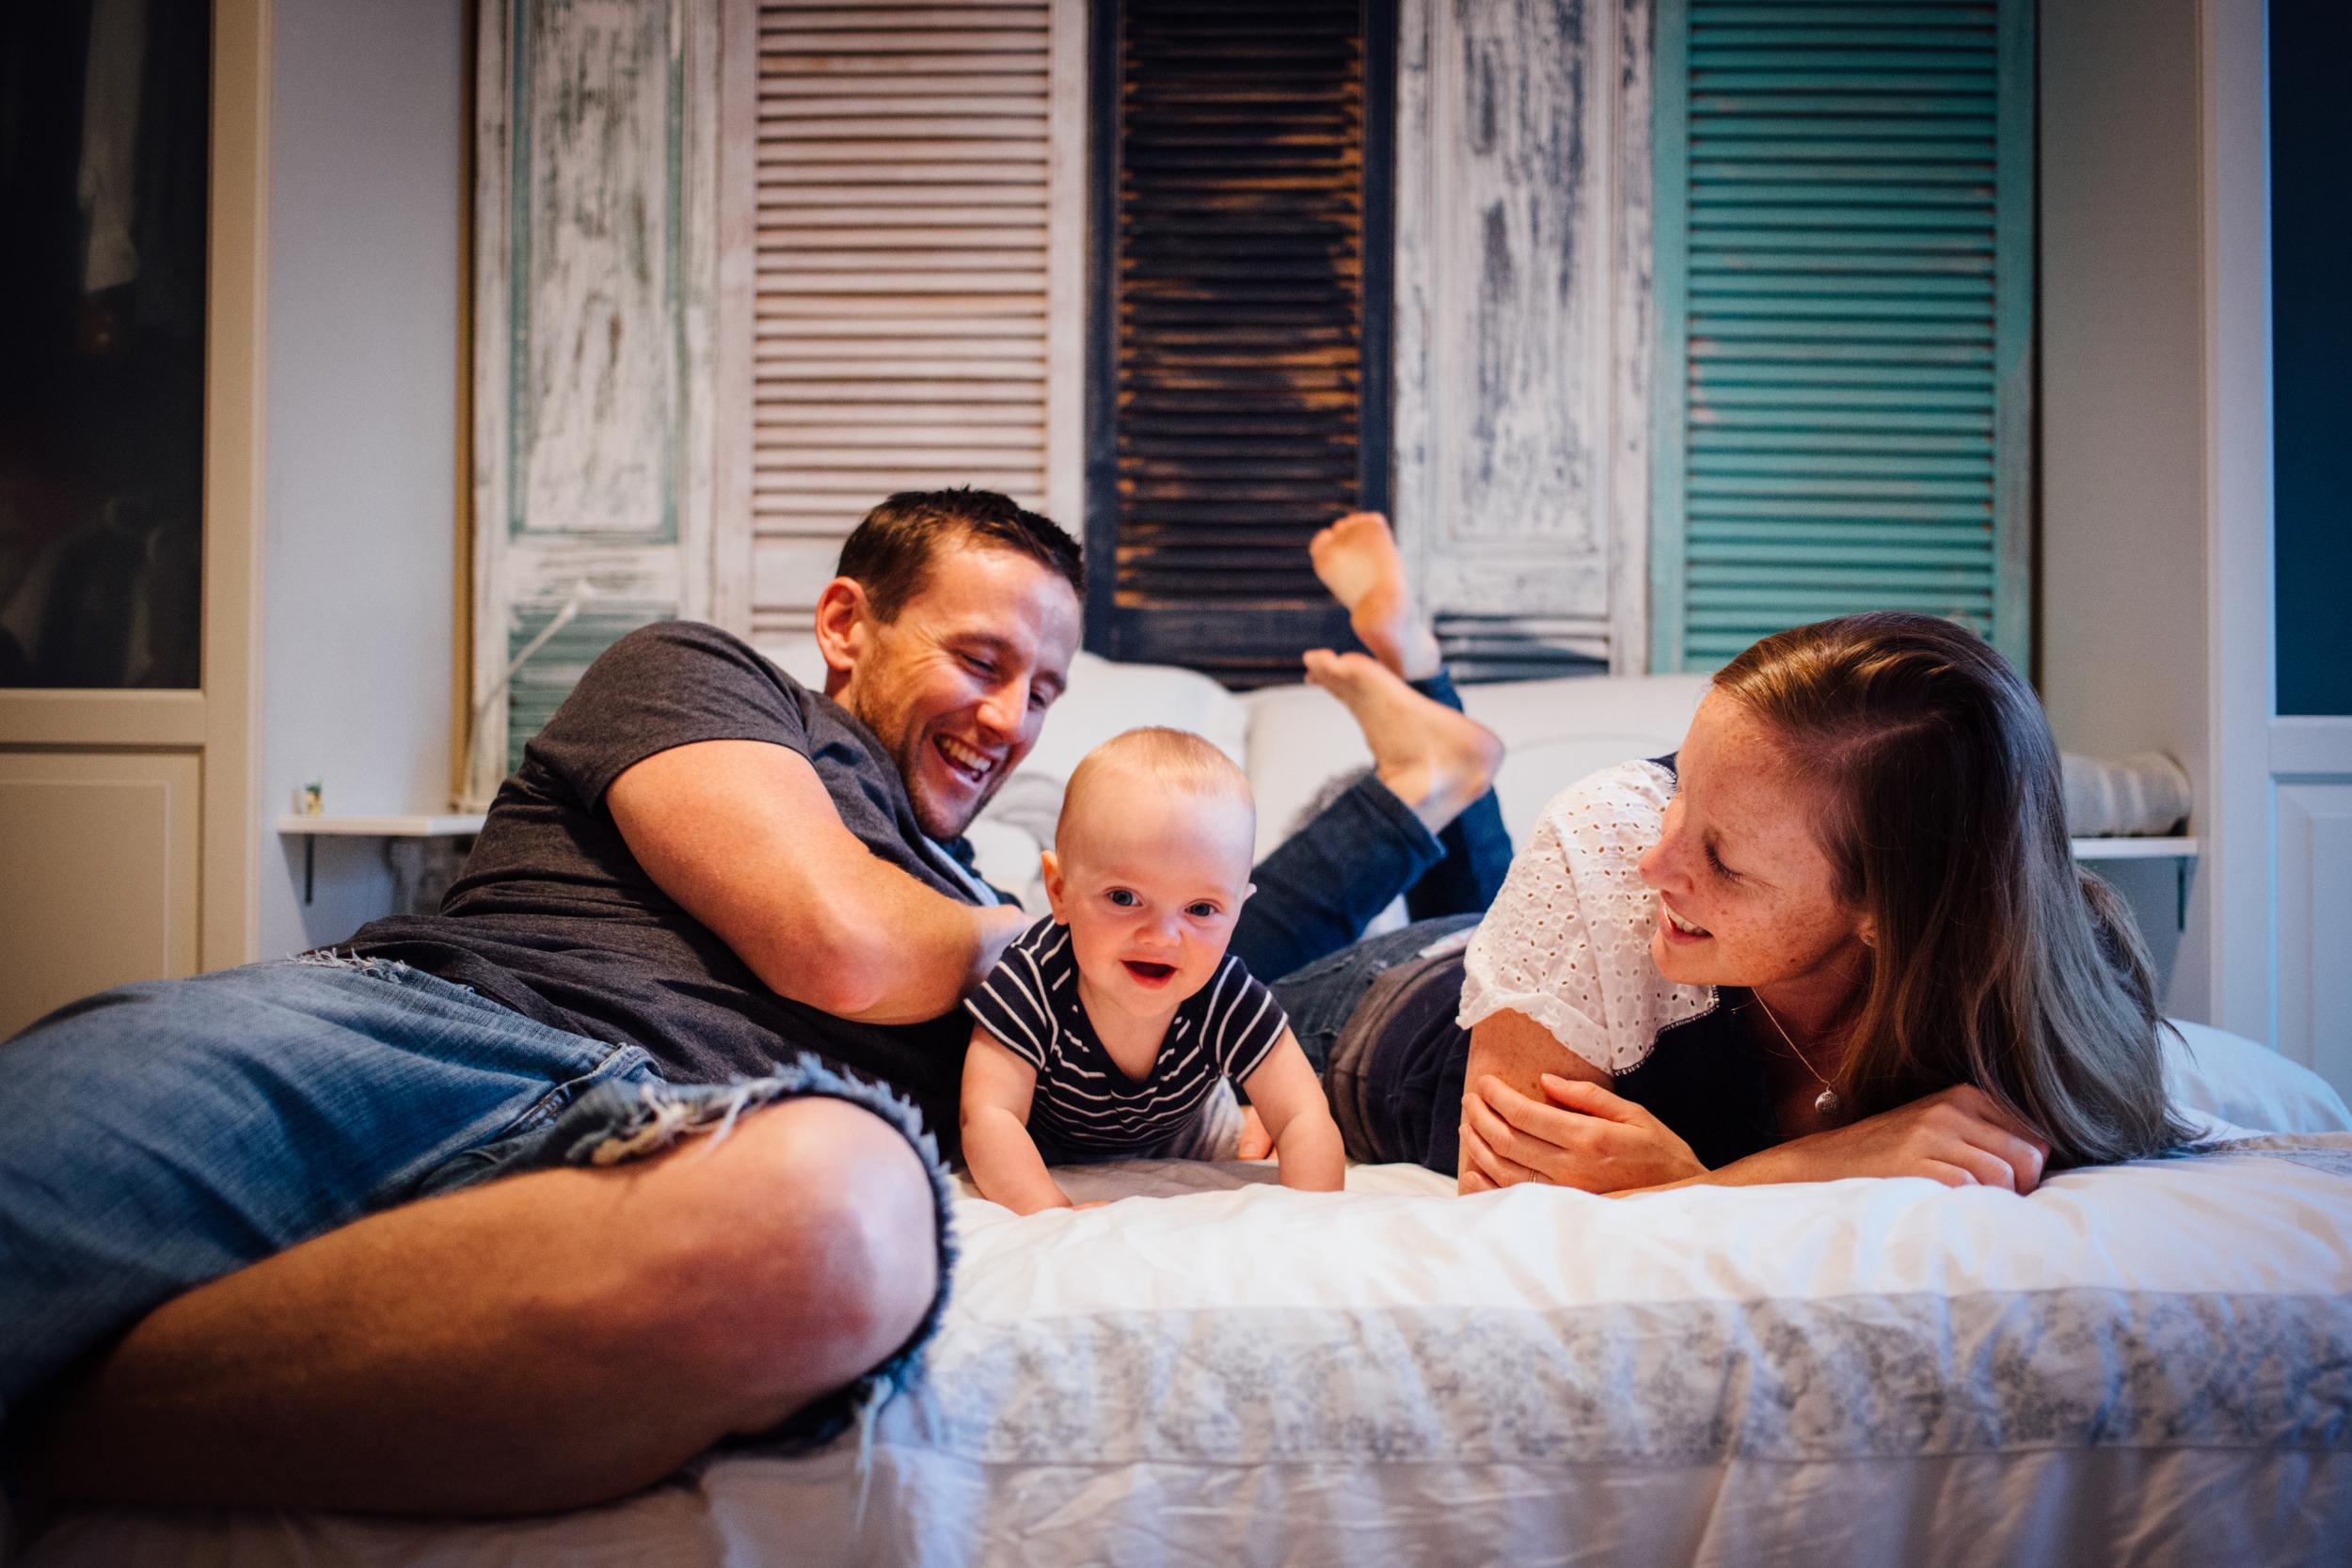 dogwoodphotography_photographer_vancouver_baby_family_babyangus-13.jpg